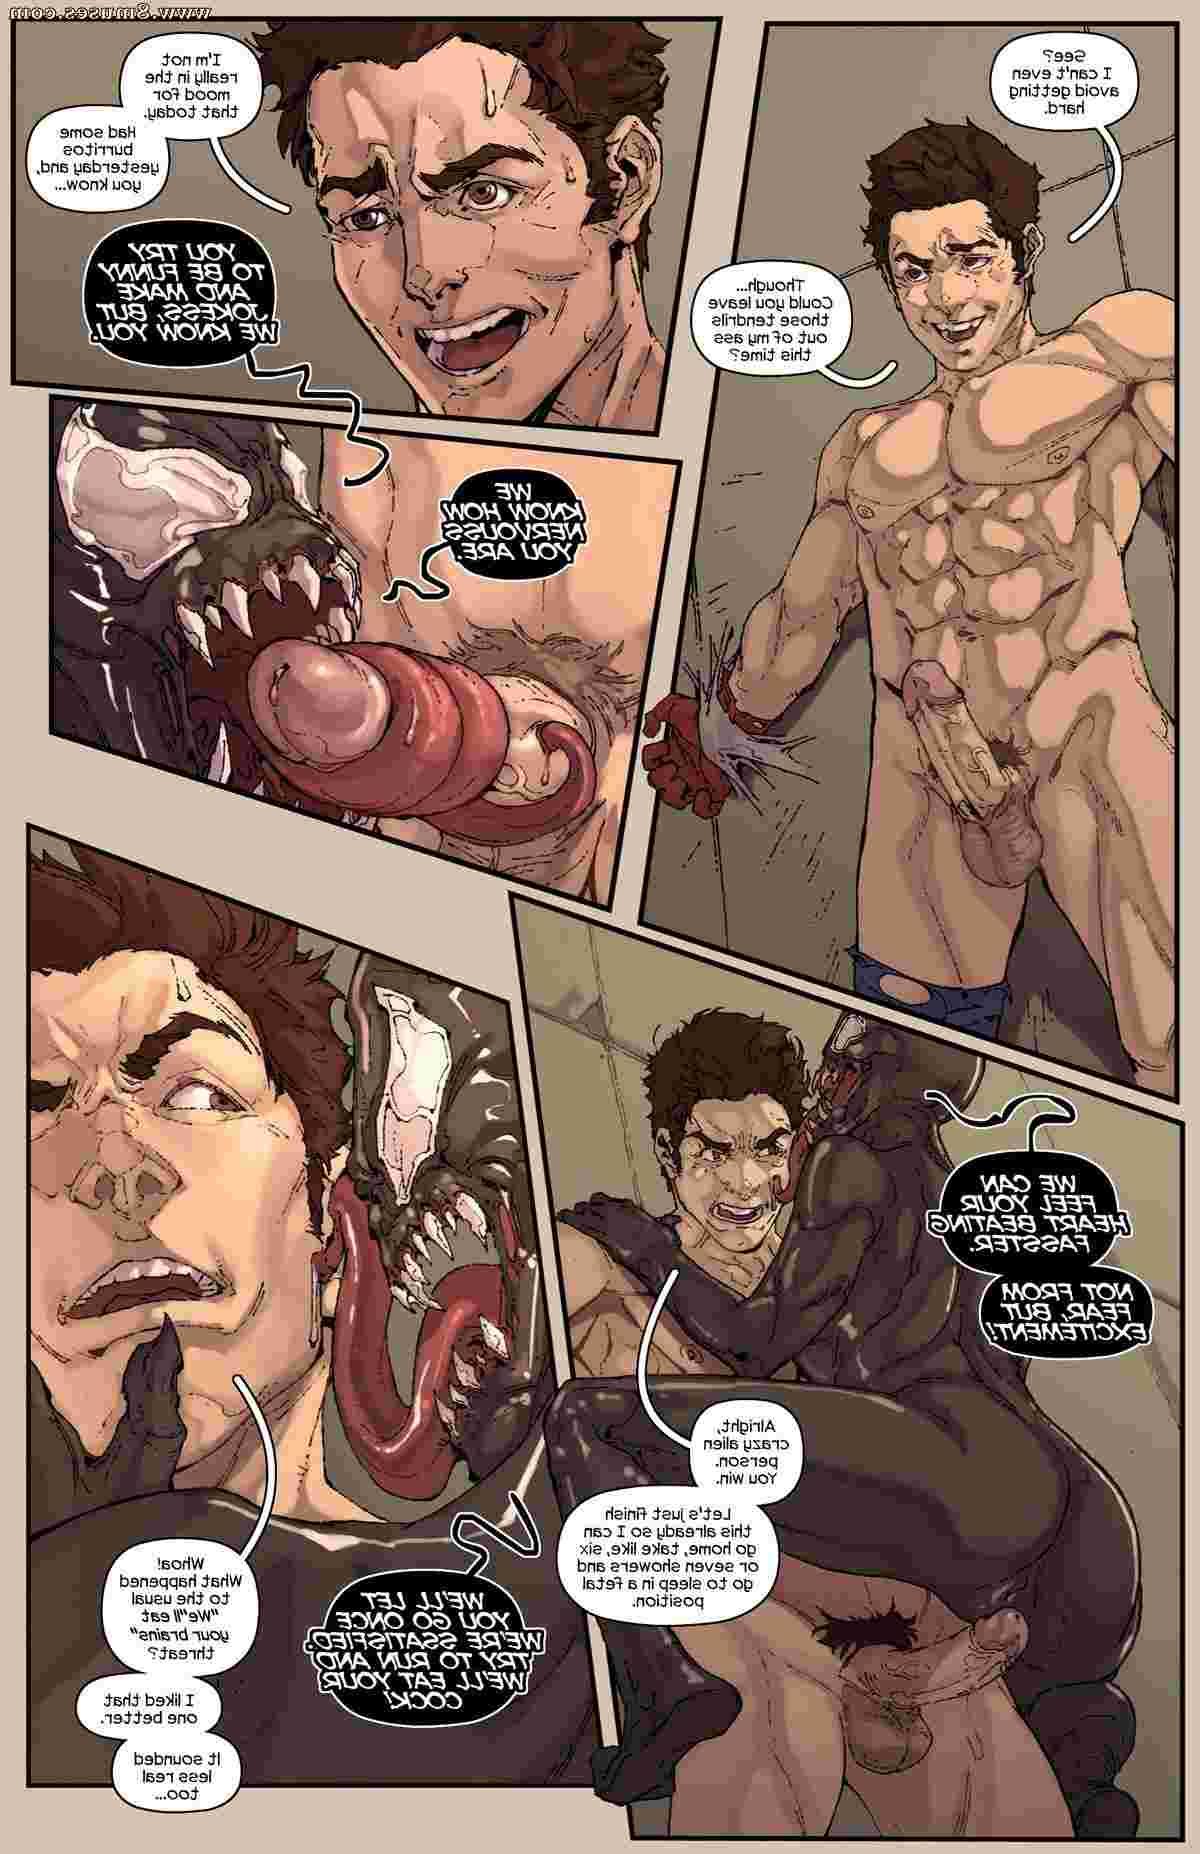 Tracy-Scops-Comics/Venomess Venomess__8muses_-_Sex_and_Porn_Comics_5.jpg